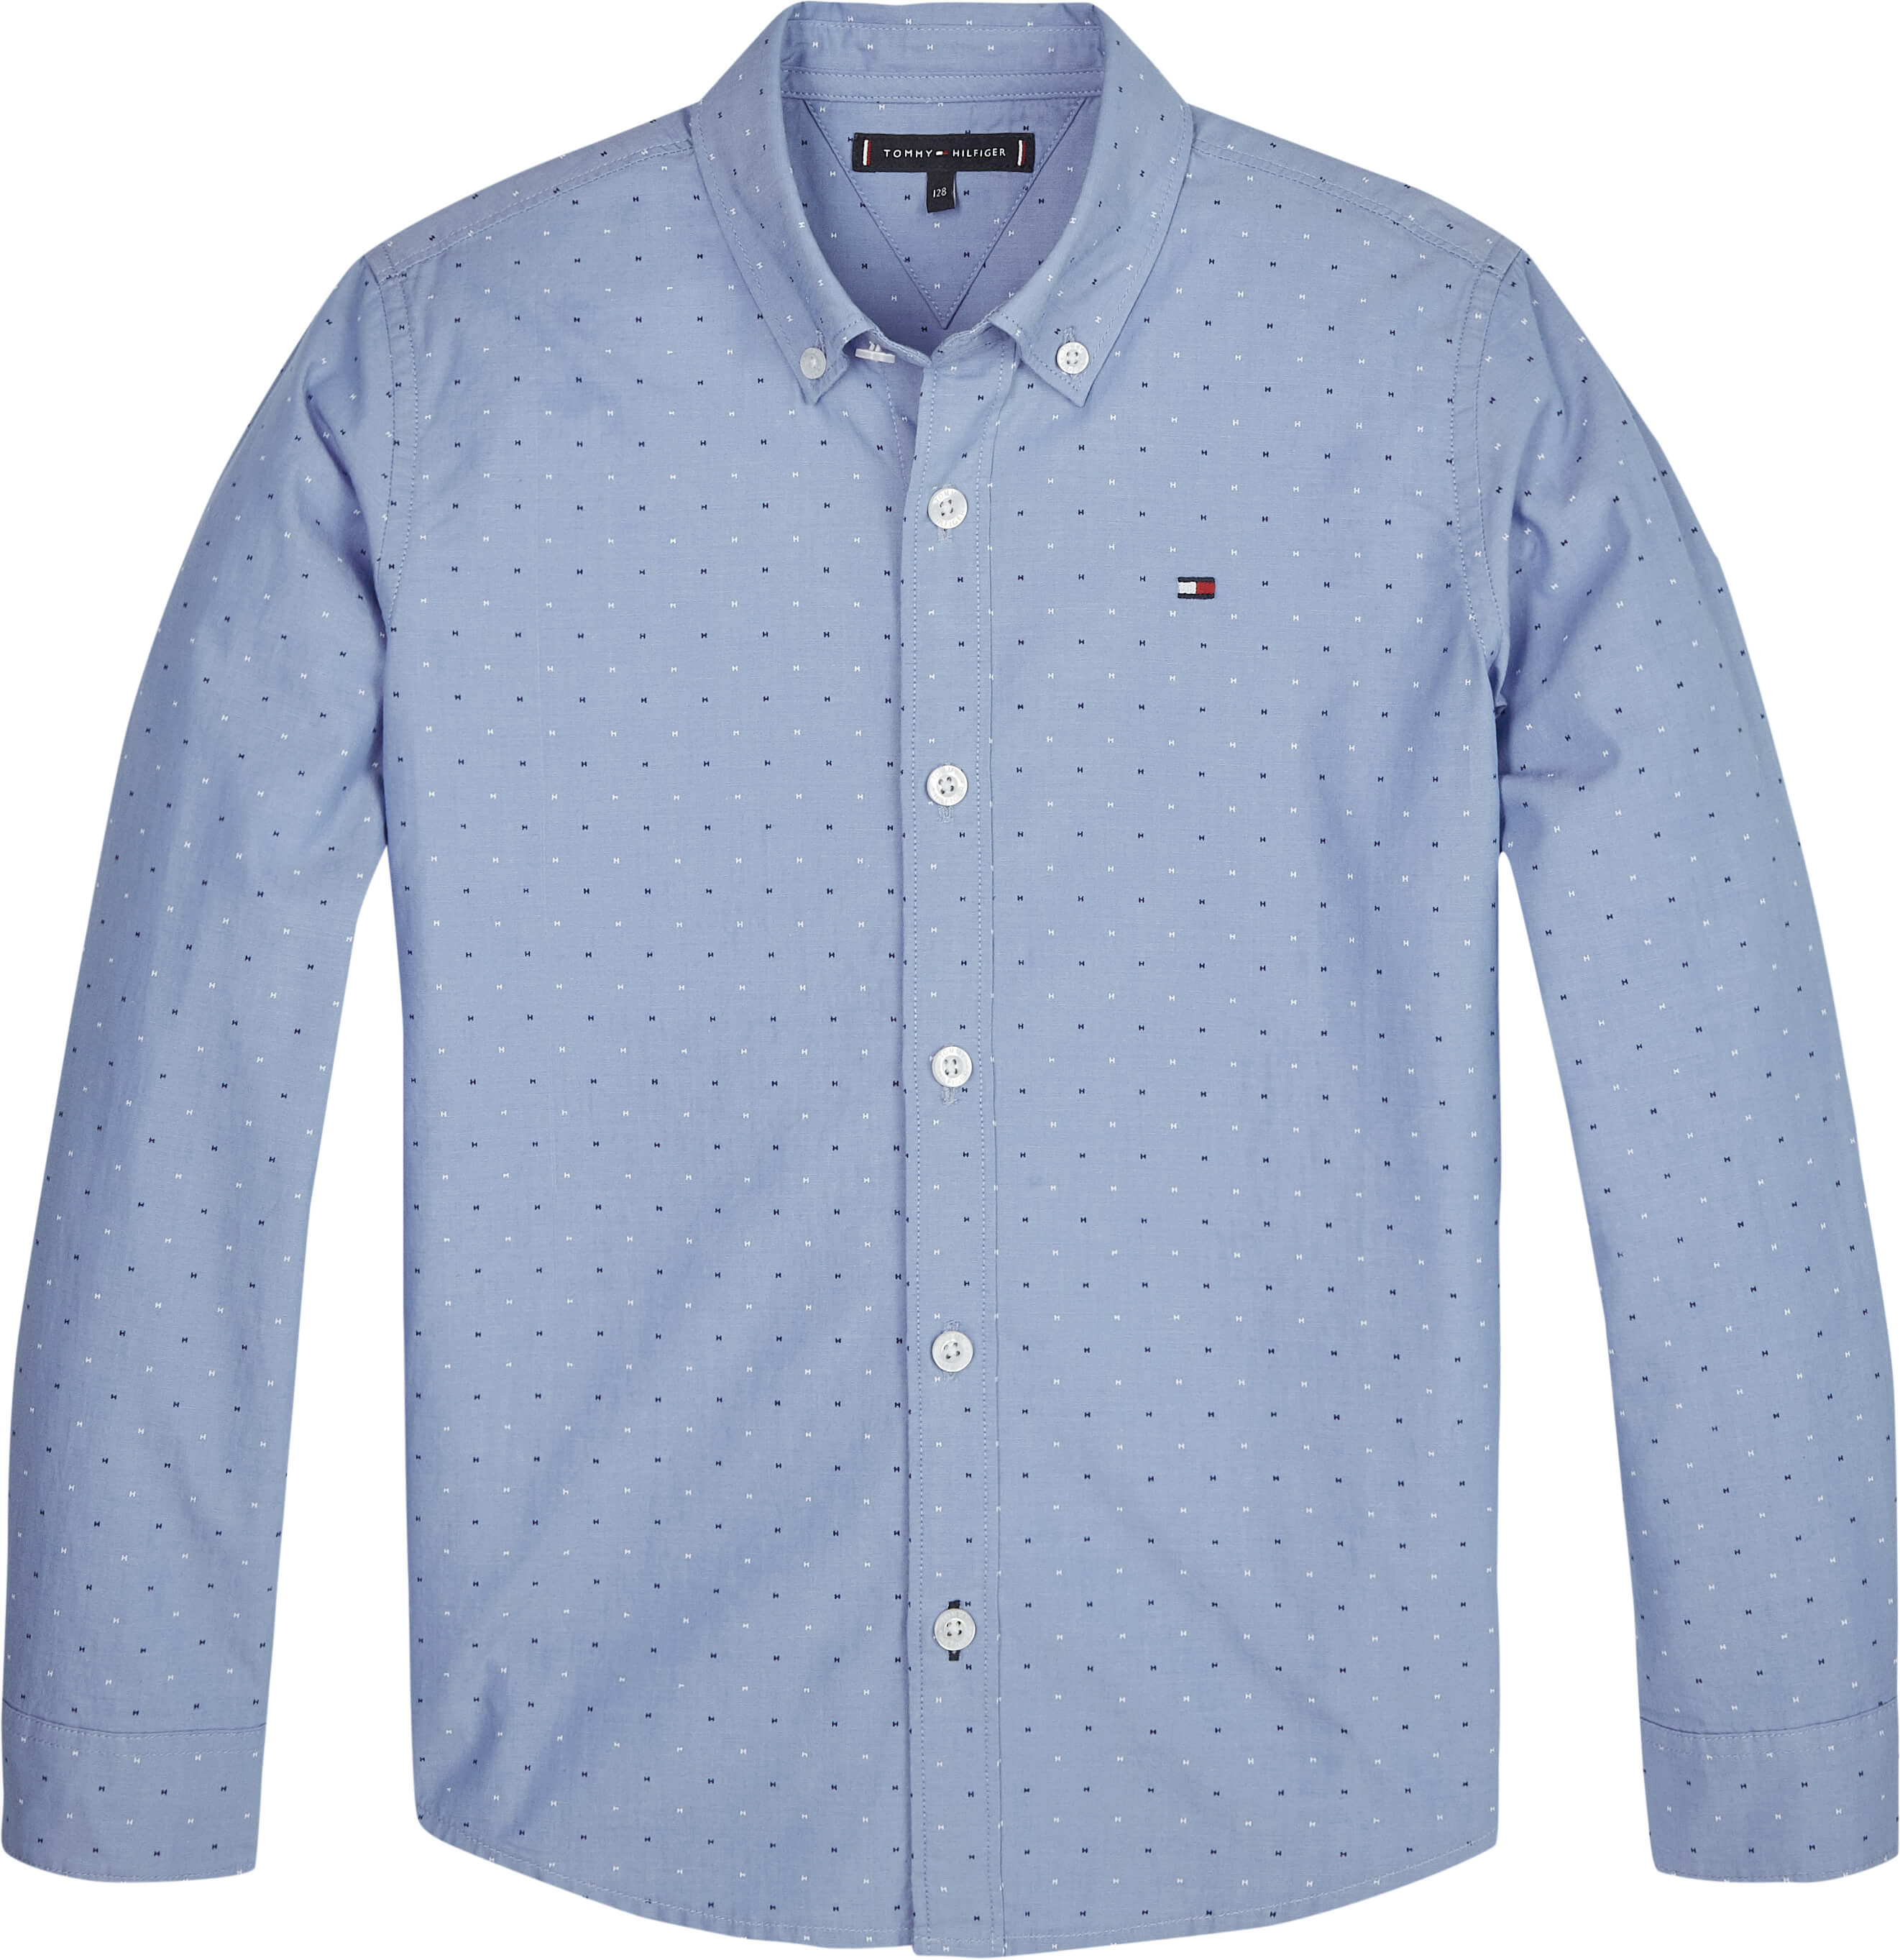 Tommy Hilfiger Childrenswear Kauluspaita, Mini Print Ls Vaaleansininen